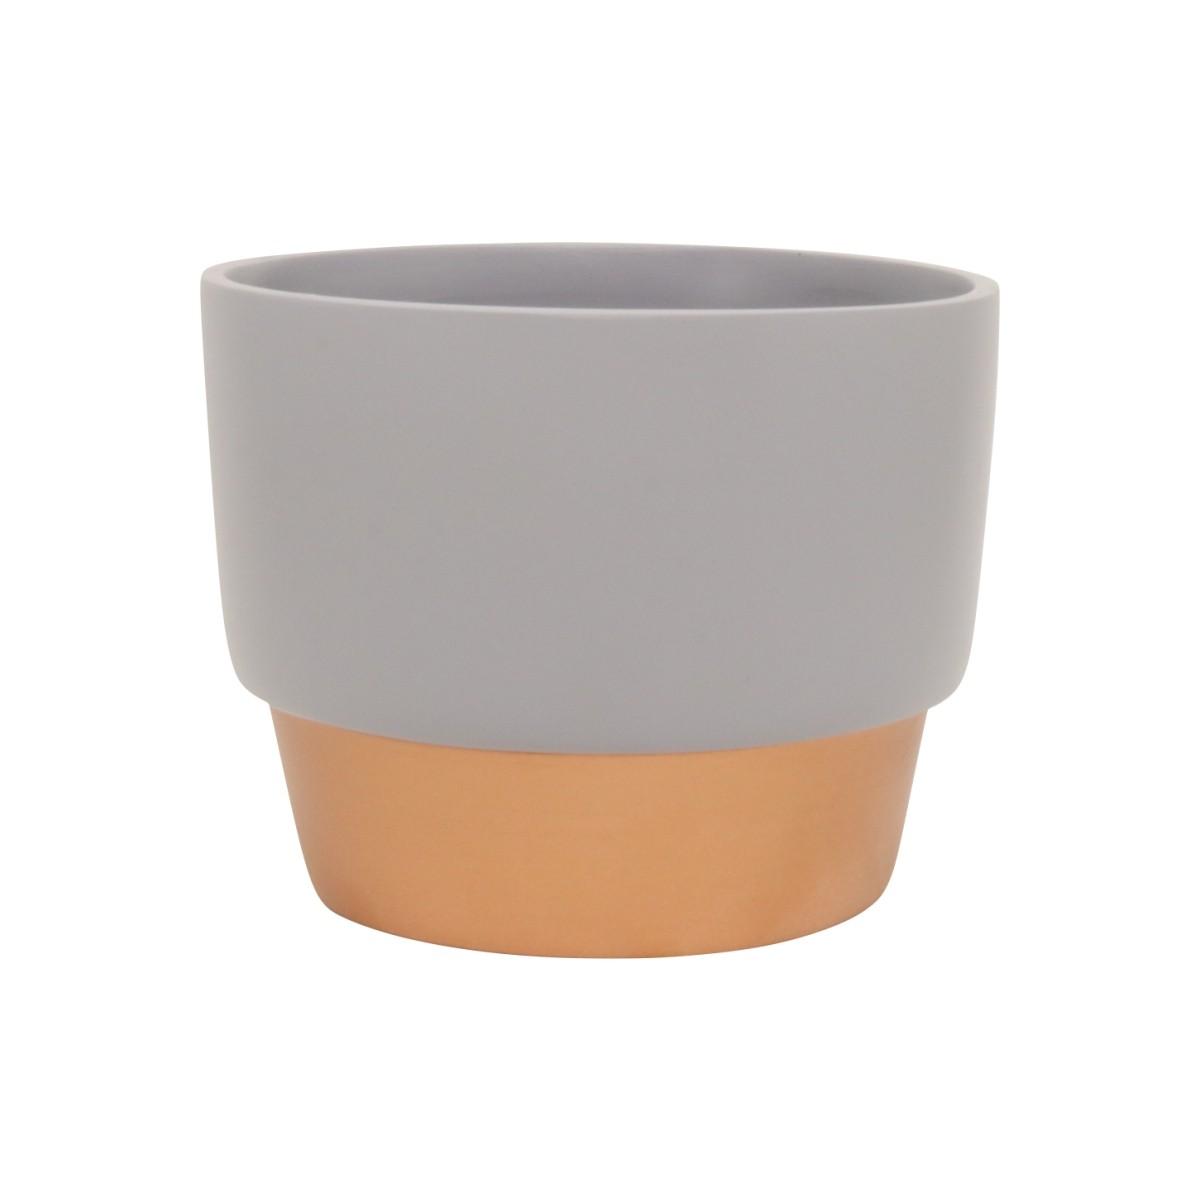 Vaso de Cerâmica para Suculentas Cinza e Bronze 10cm x 12,5cm - 5760